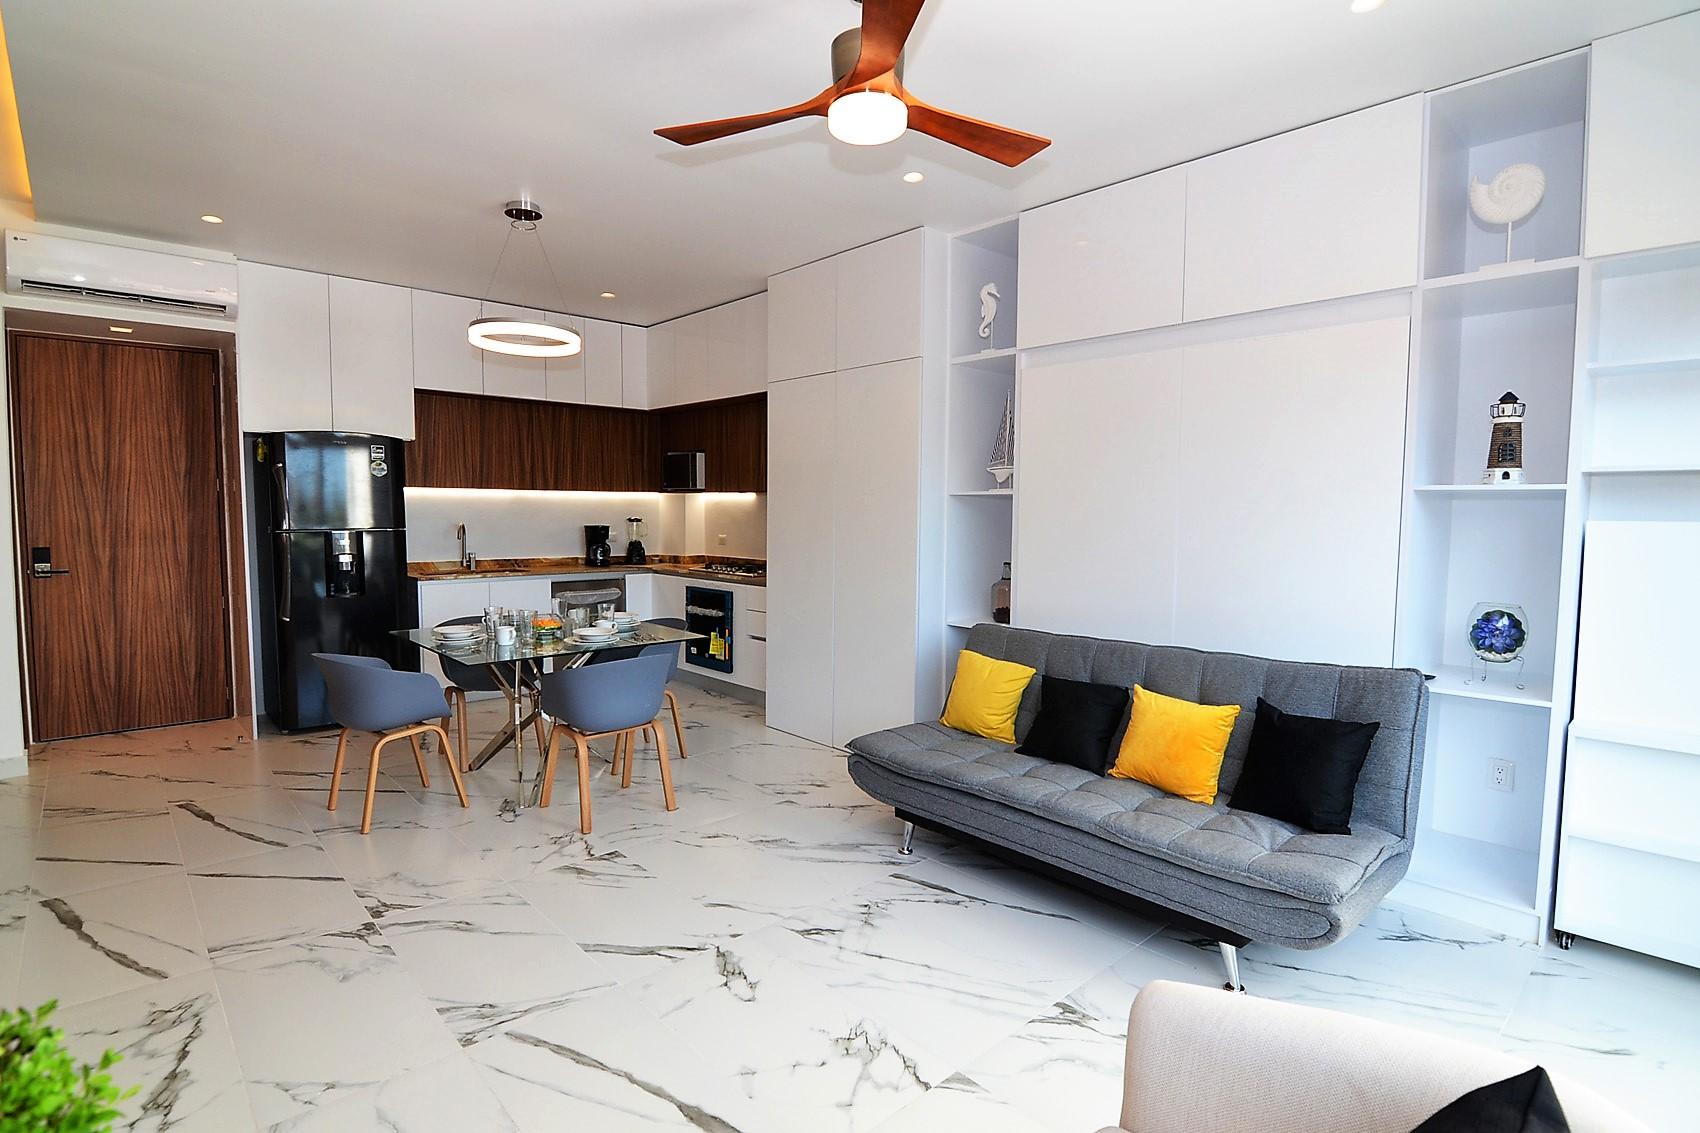 Condo Avida Super Studio 4 - Puerto Vallarta Furnished Condo Romantic Zone (11)